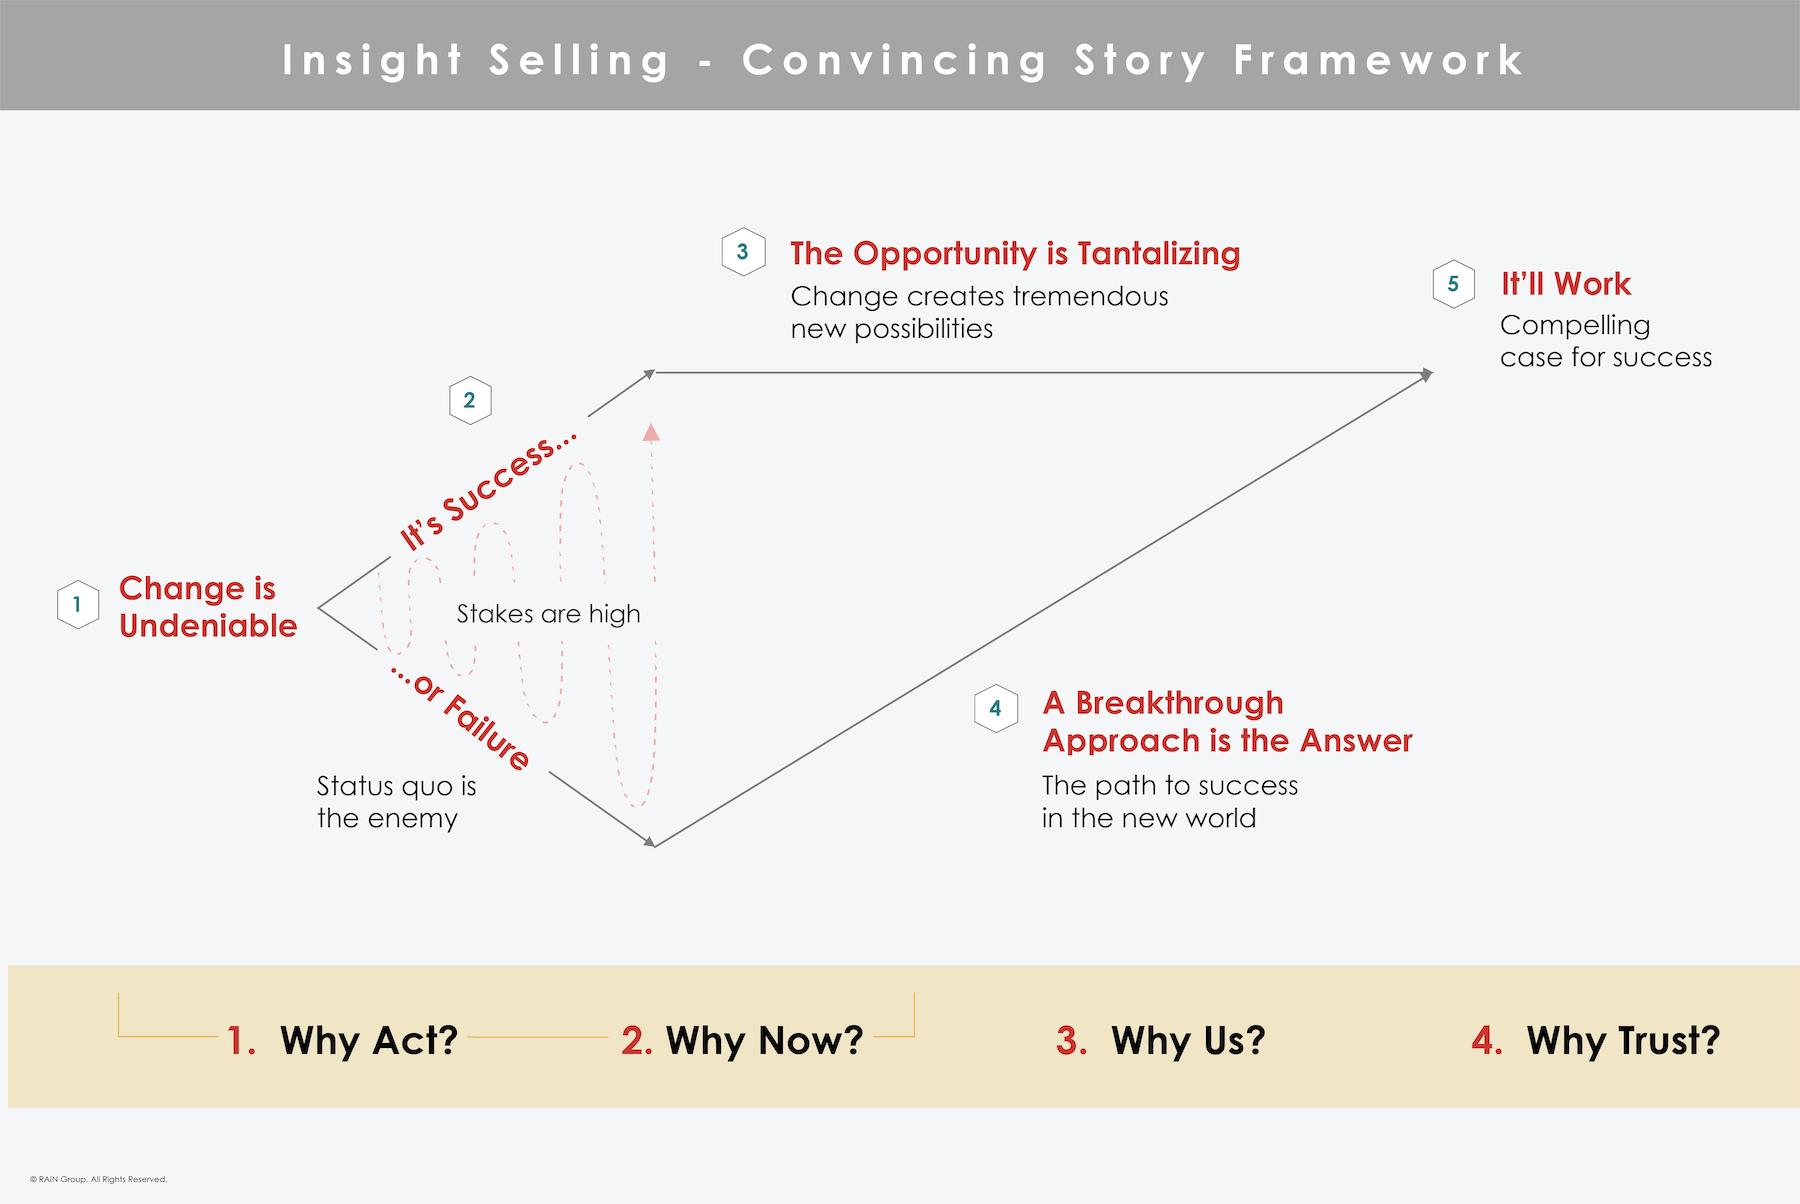 Convicing Story Framework